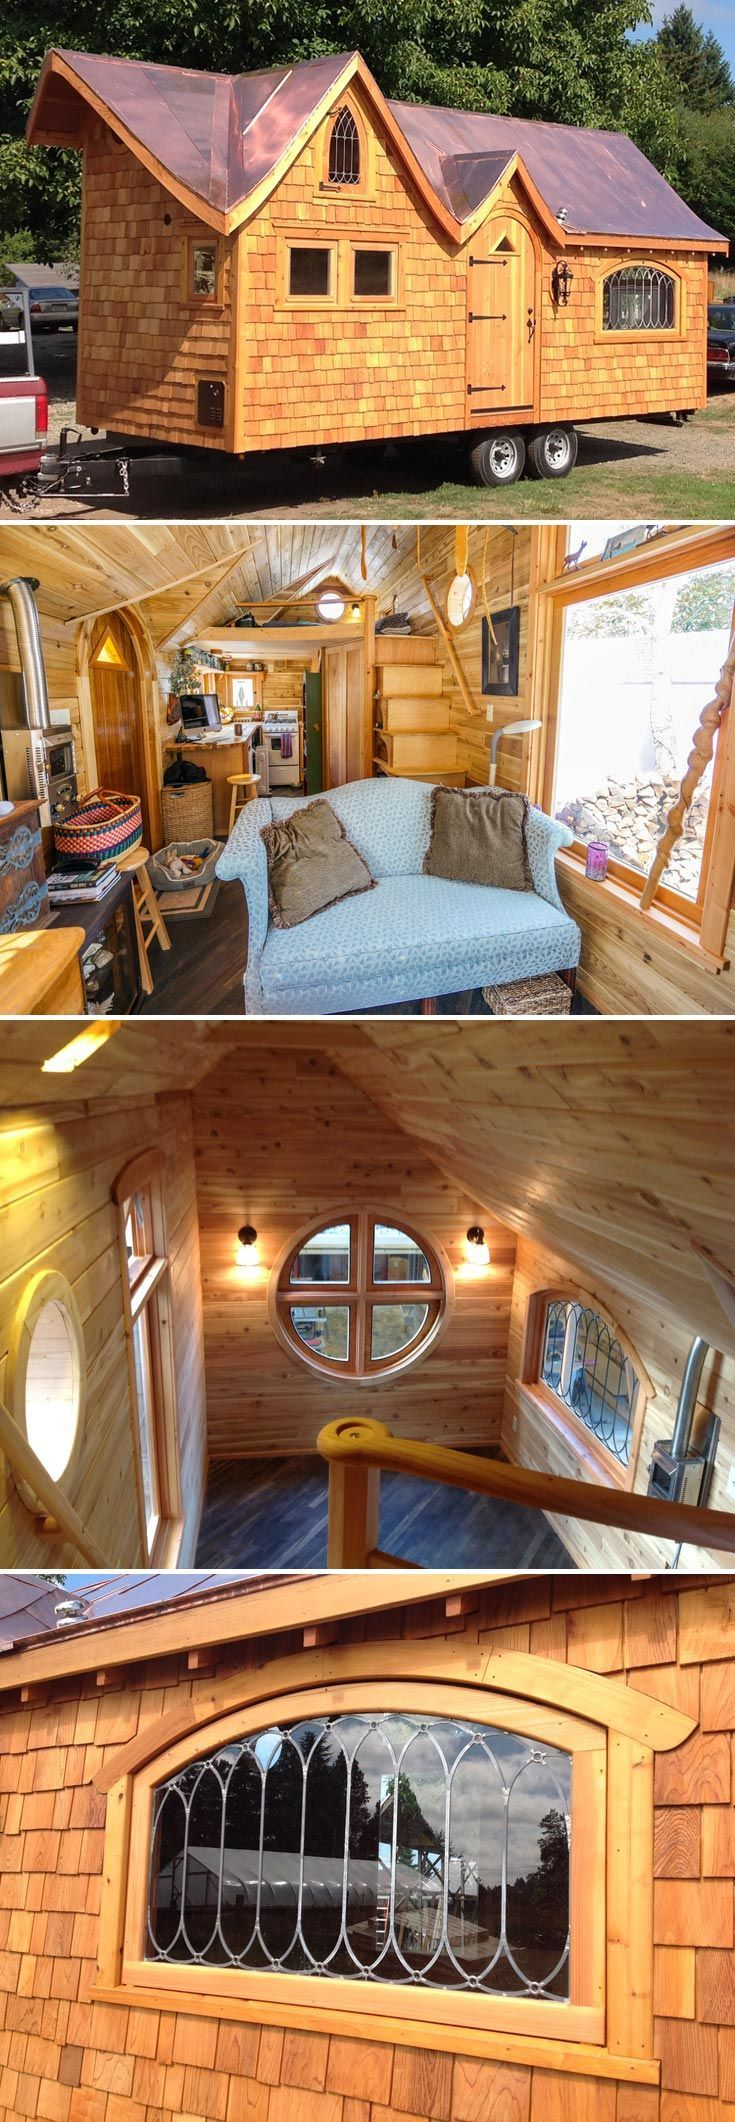 17 Best ideas about Dormer Roof on Pinterest Shed dormer